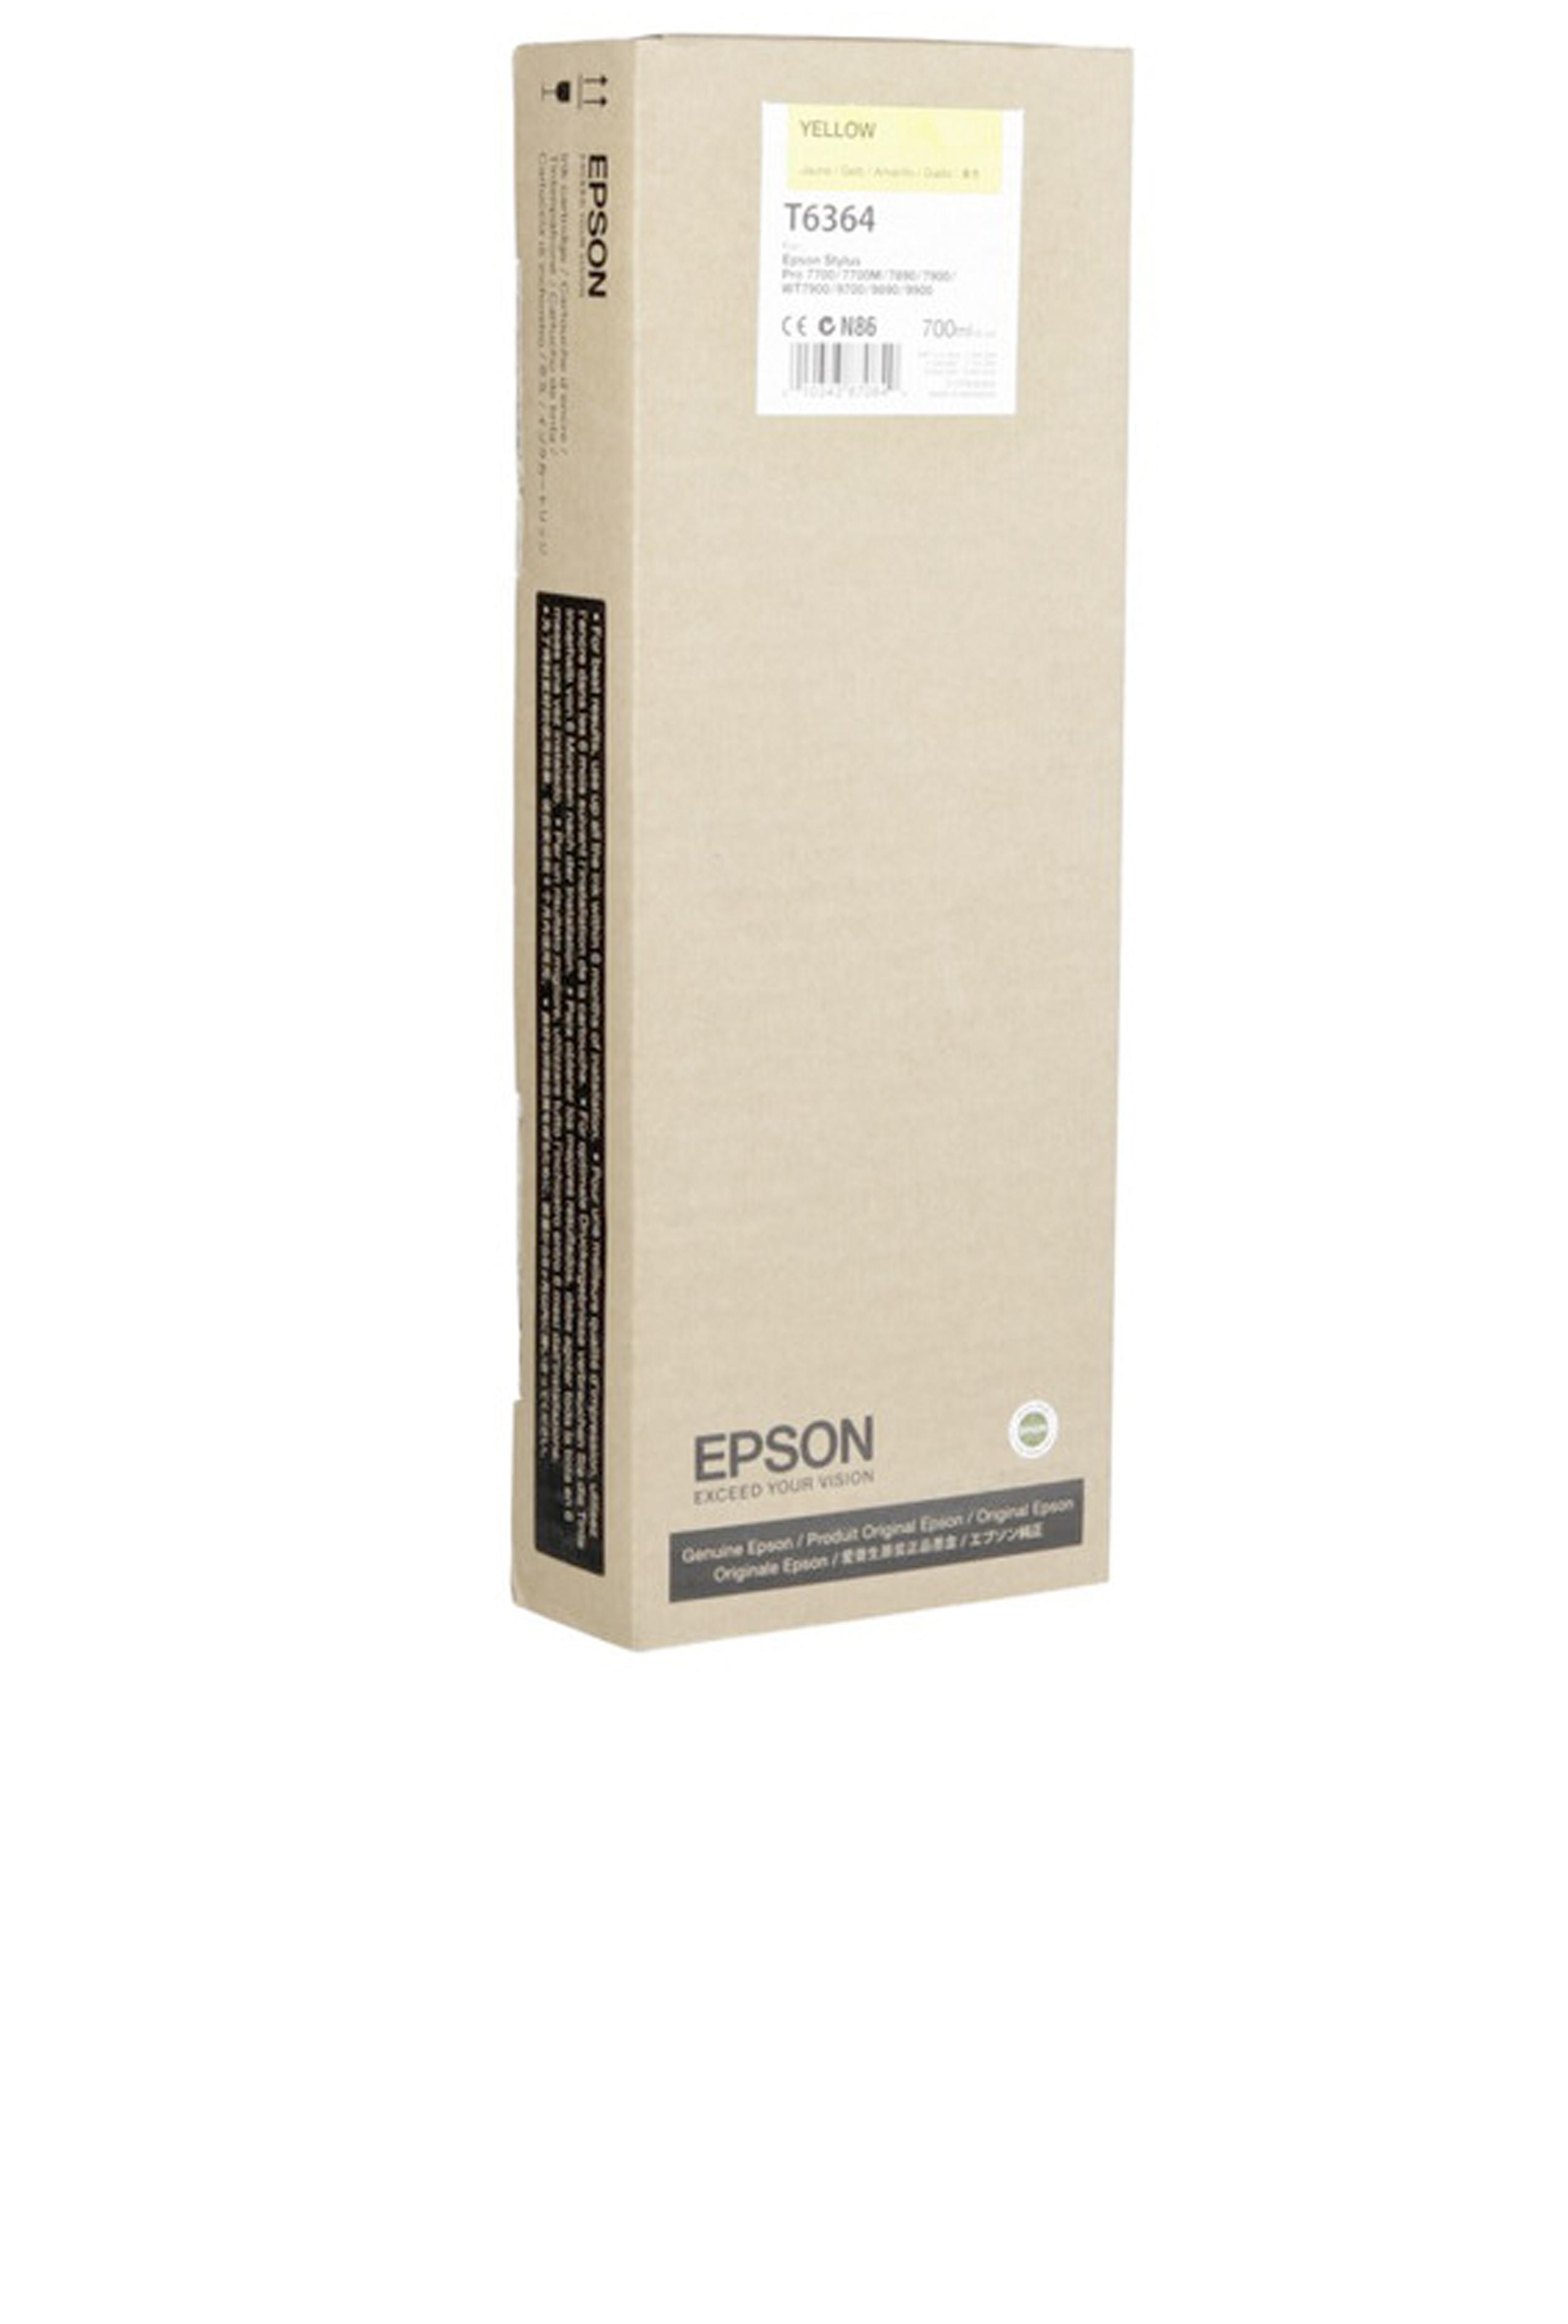 Epson EPSON HI YELLOW INK (700 ML) (T636400)